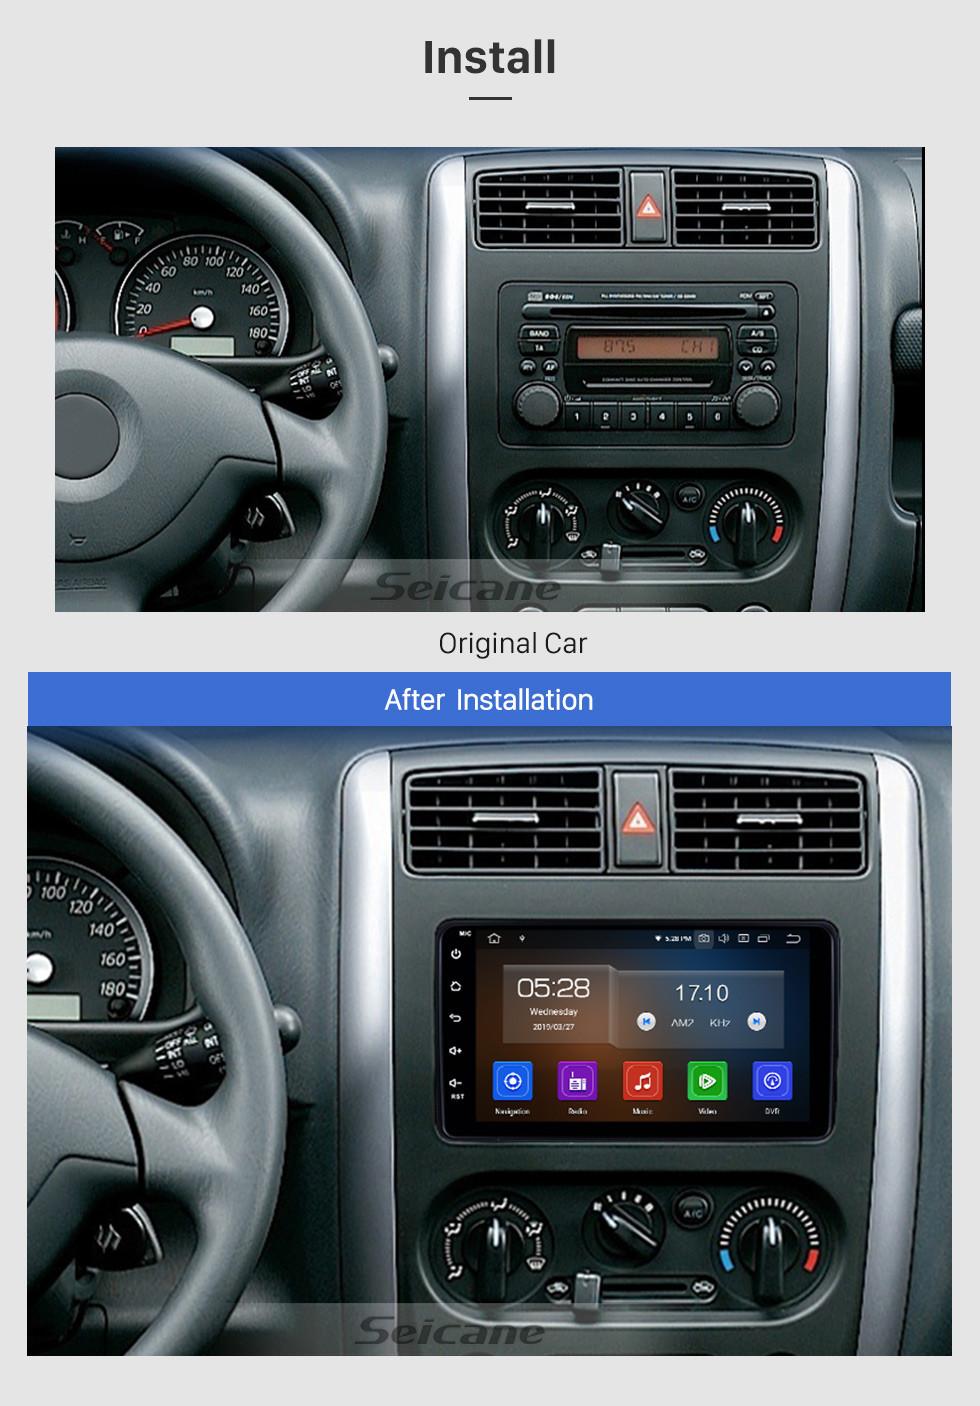 Seicane HD-Touchscreen 2007-2012 Suzuki JIMNY Android 9.0 Radio GPS-Autoradio Bluetooth-Musik MP3-TV-Tuner AUX Lenkradsteuerung USB-Unterstützung Rückwärtskamera CD DVD-Player